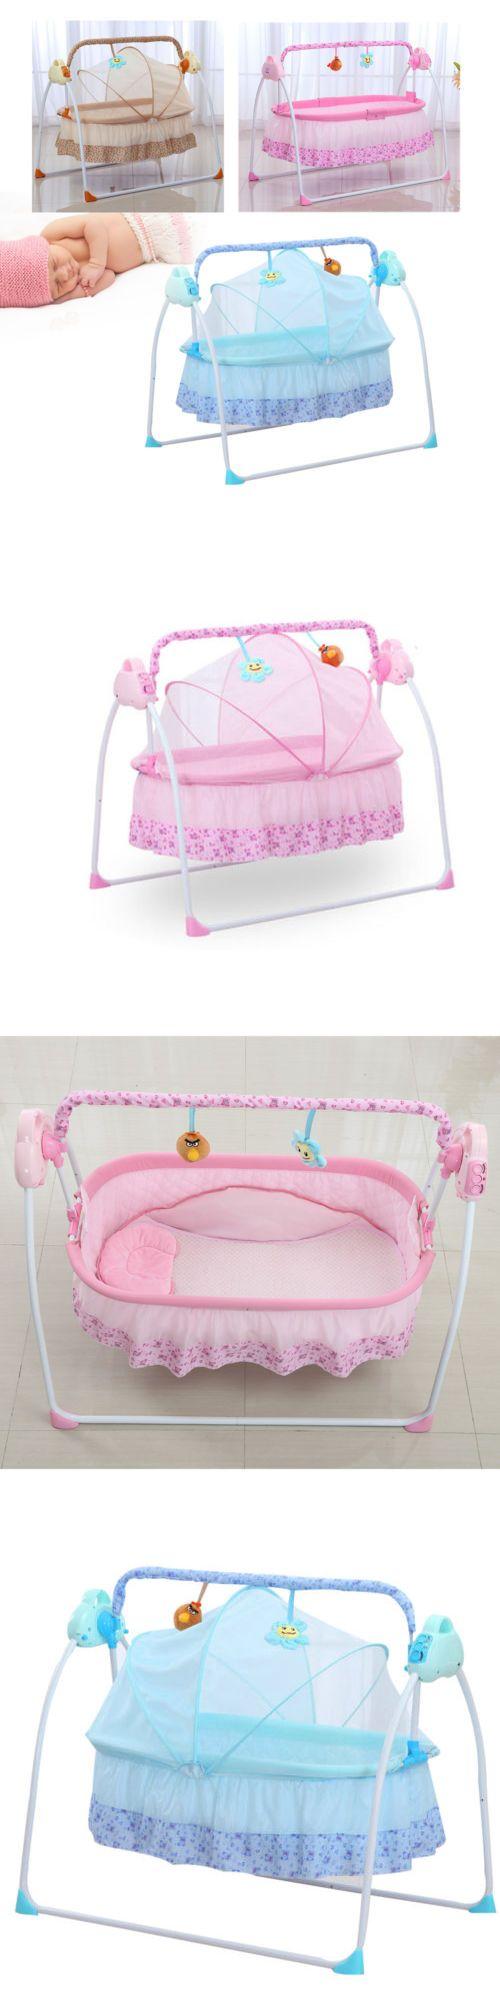 Baby Swings 2990: Electric Baby Crib Cradle Infant Rocker Auto Swing Bed Baby Sleep Cradle + Mat -> BUY IT NOW ONLY: $119.76 on eBay!